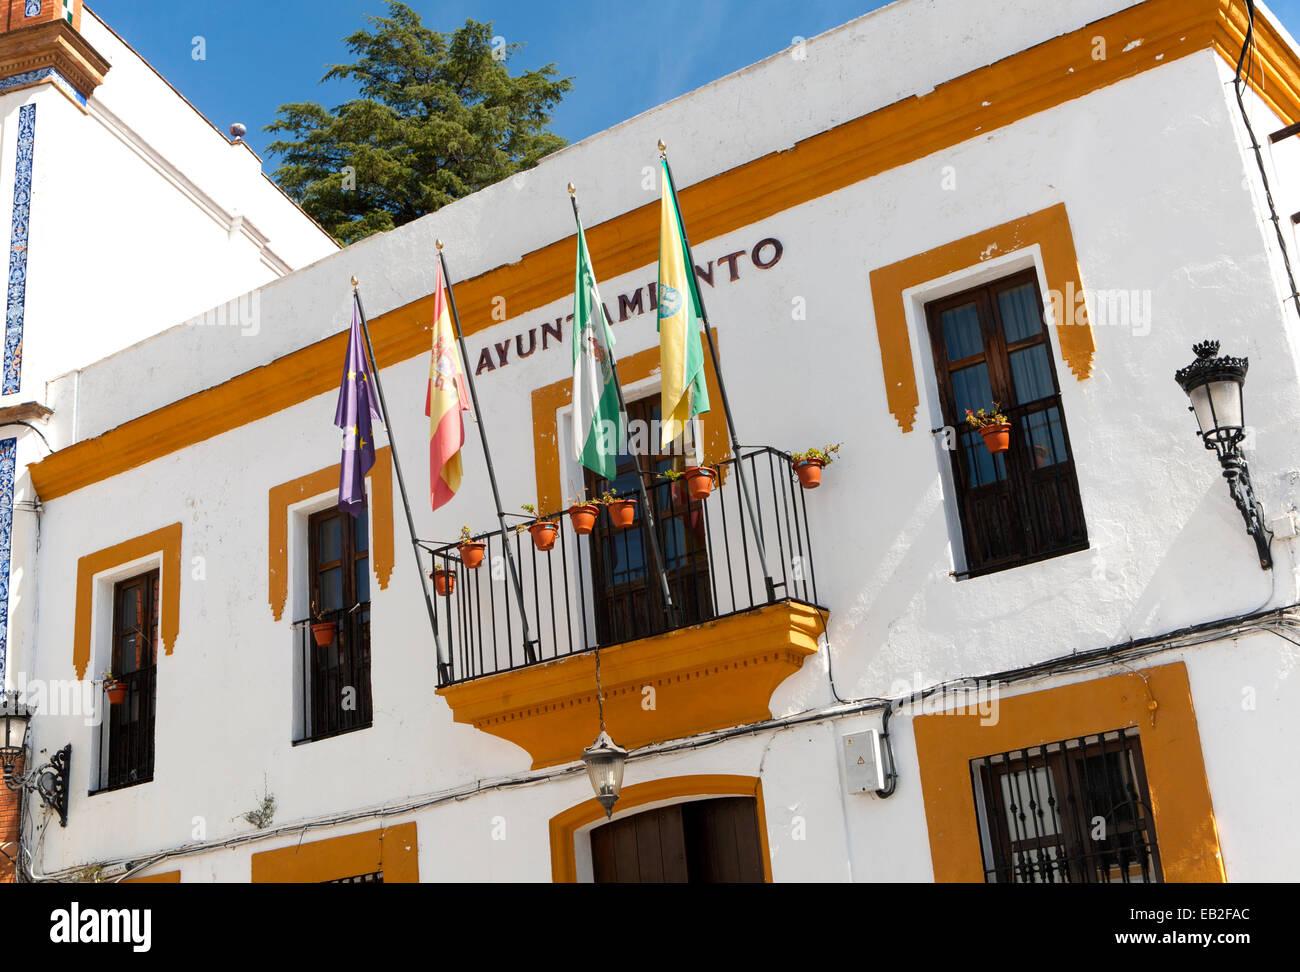 Ayuntamiento town hall building with flags in village of Alajar, Sierra de Aracena, Huelva province, Spain Stock Photo